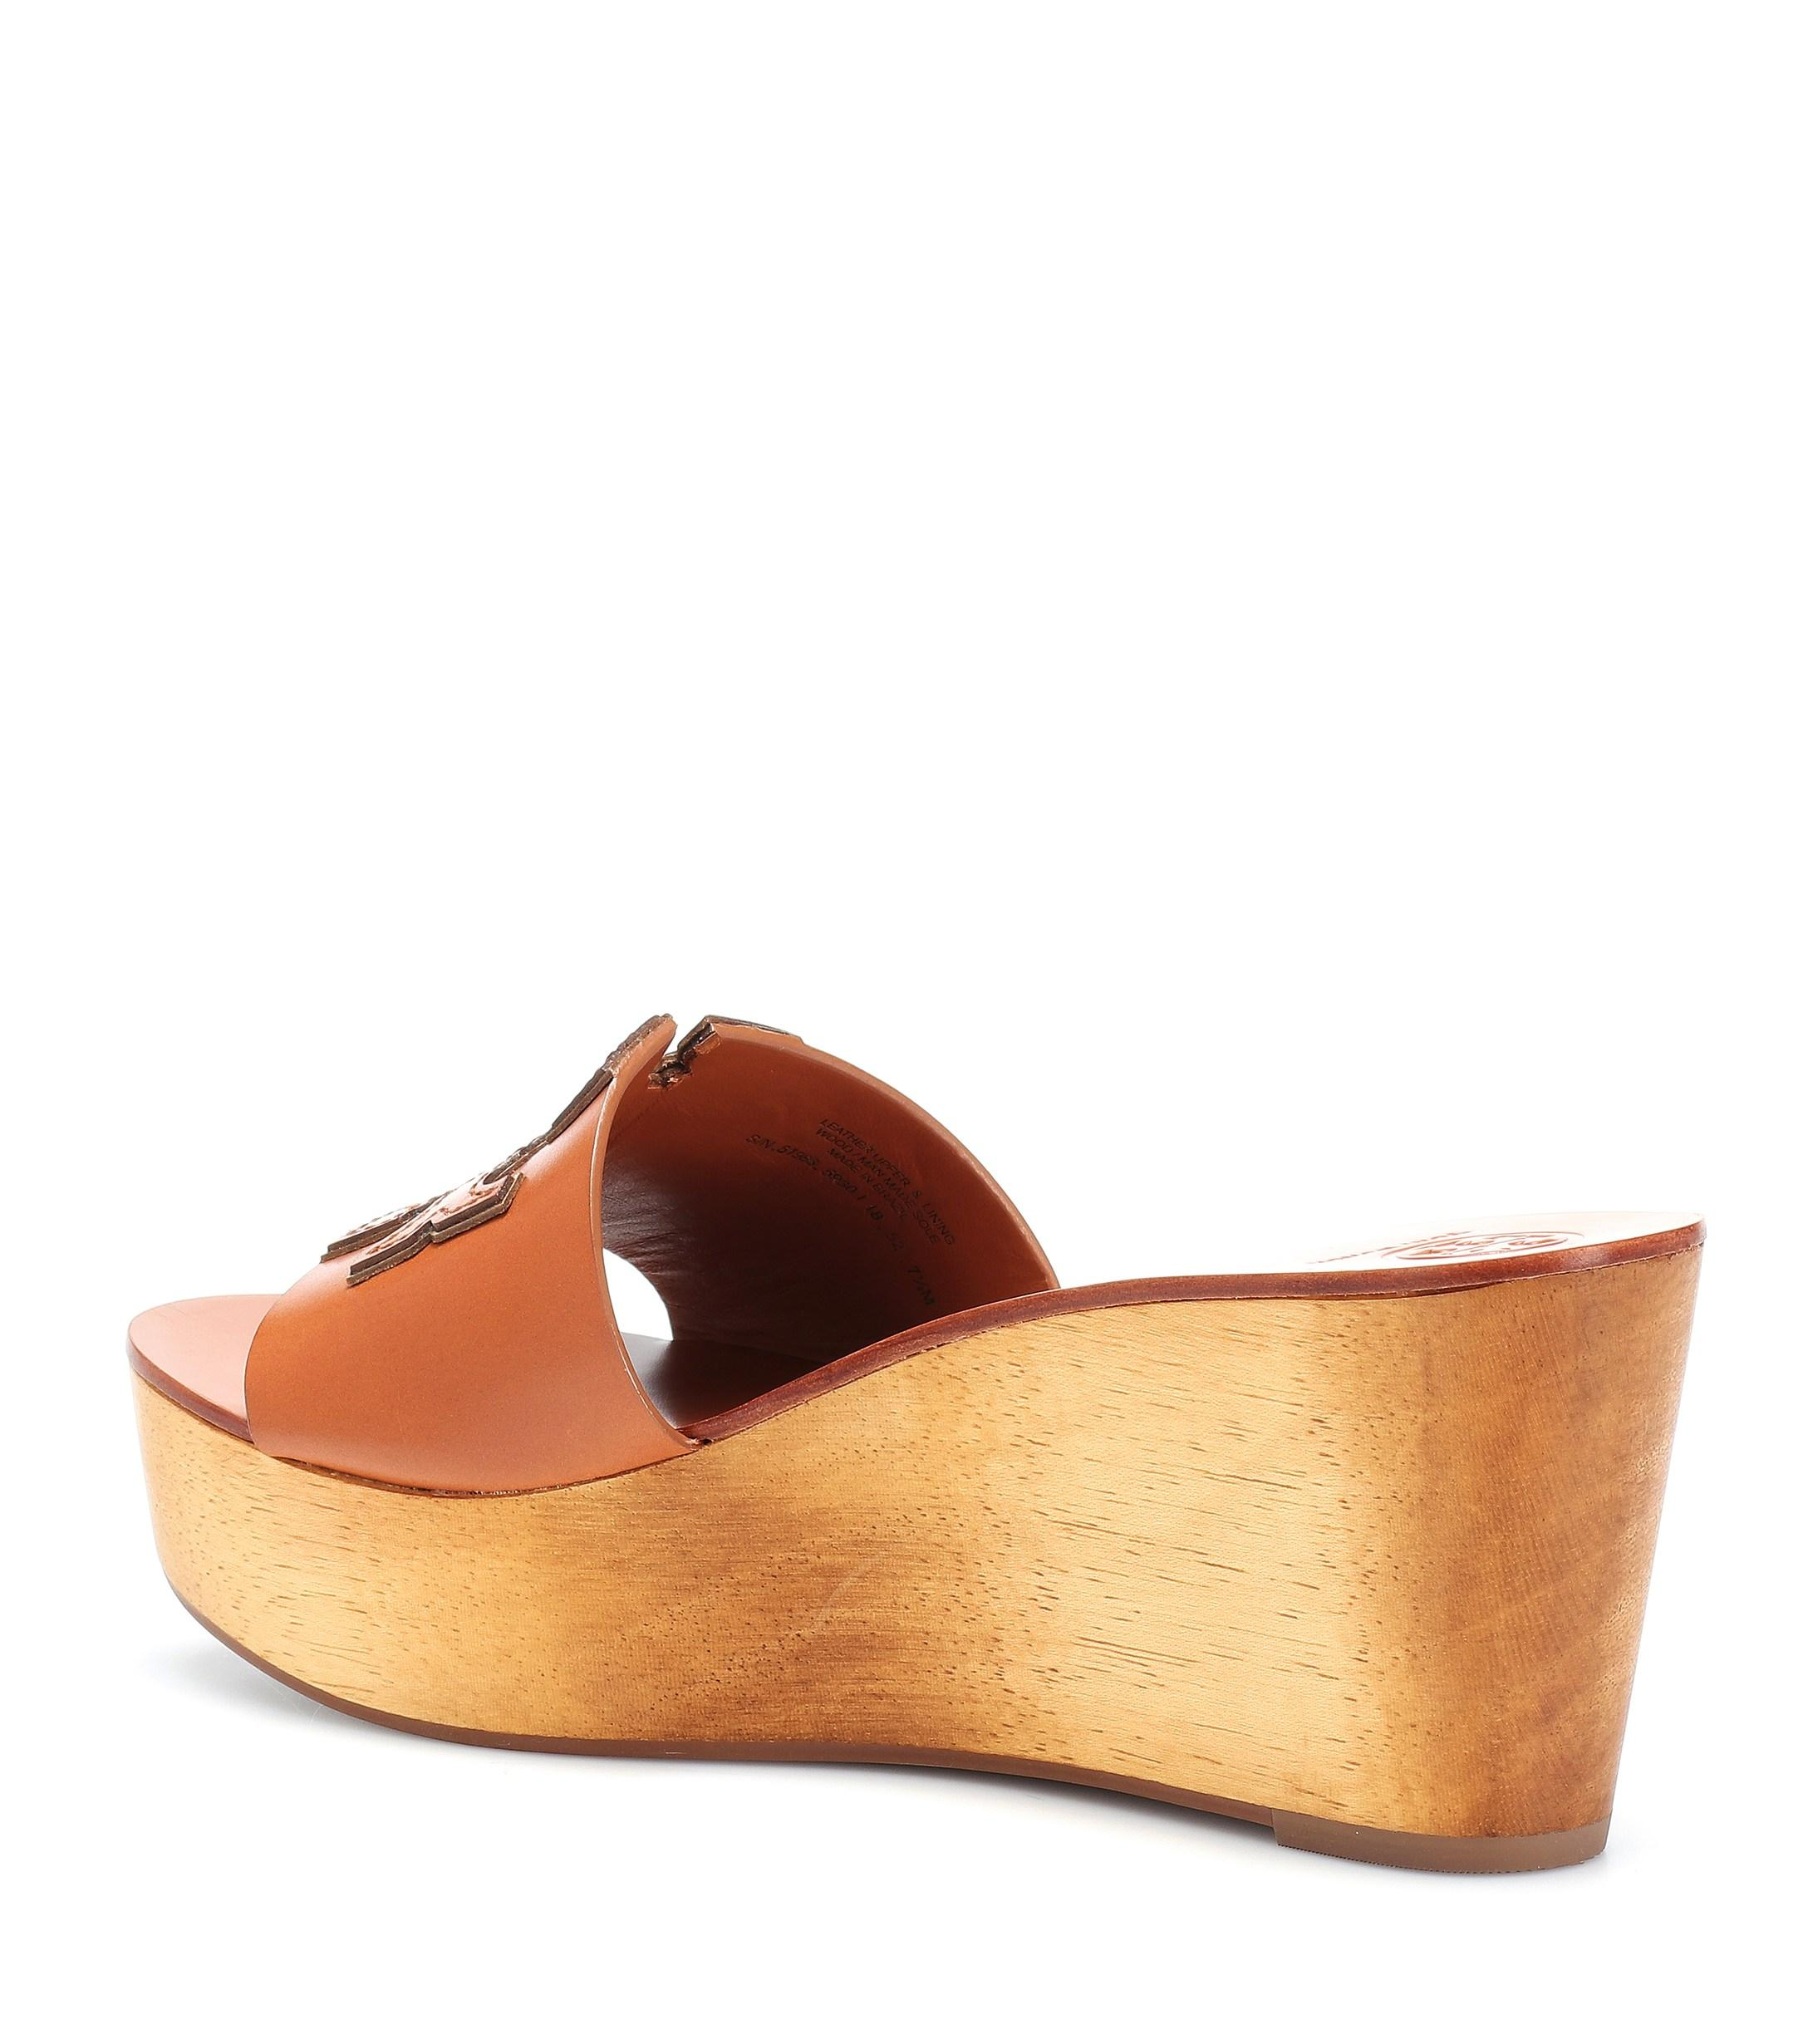 4349583ba686ba Tory Burch - Brown Ines 80mm Leather Wedge Sandals - Lyst. View fullscreen